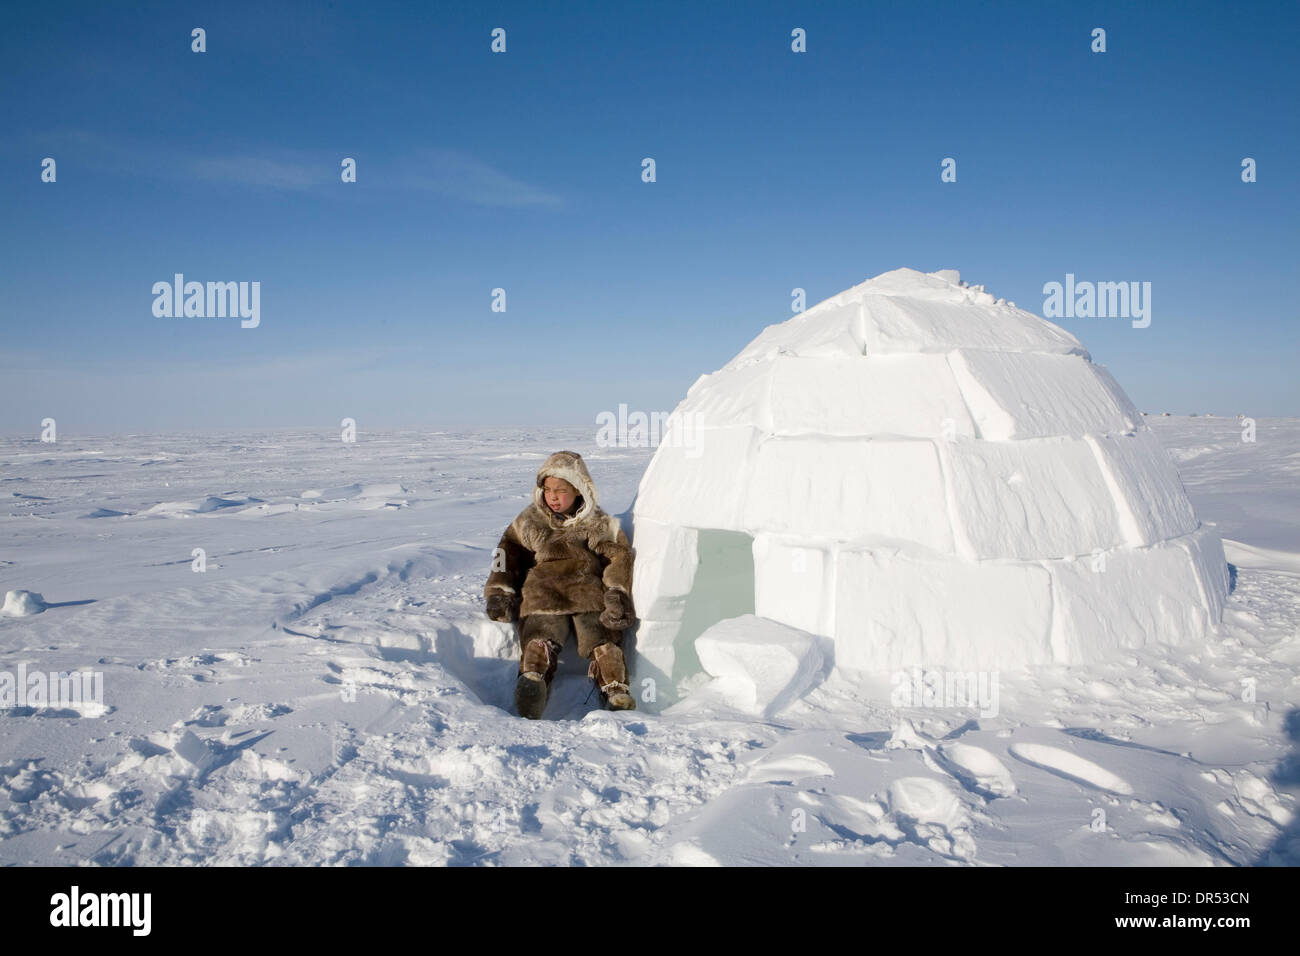 Inuit Igloo Home Stock Photos & Inuit Igloo Home Stock